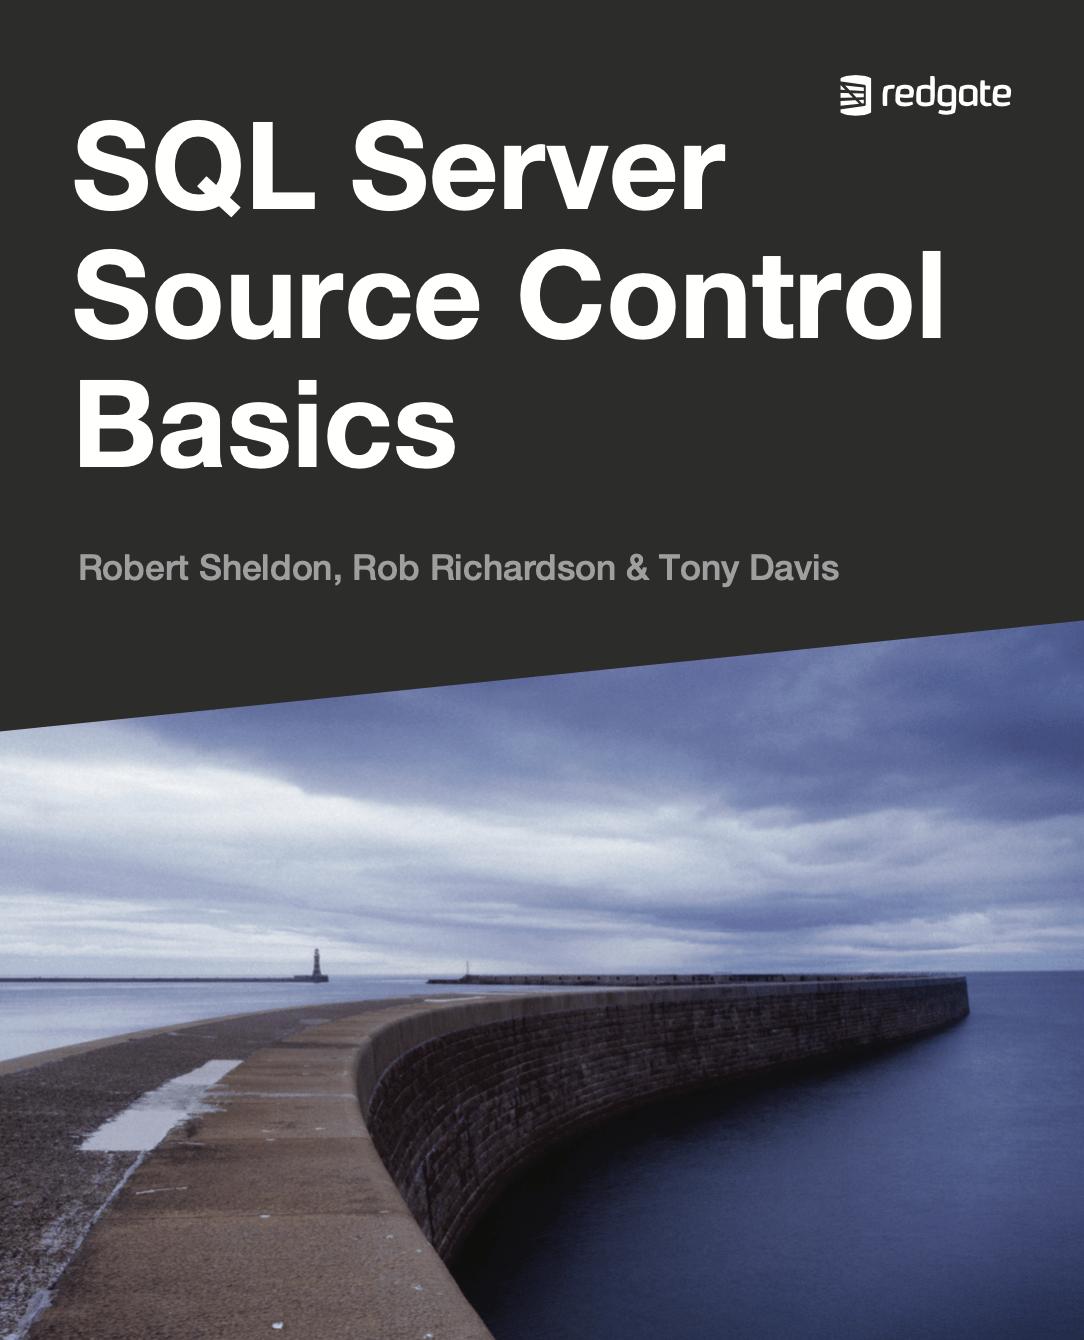 SQL Server Source Control Basics eBook cover